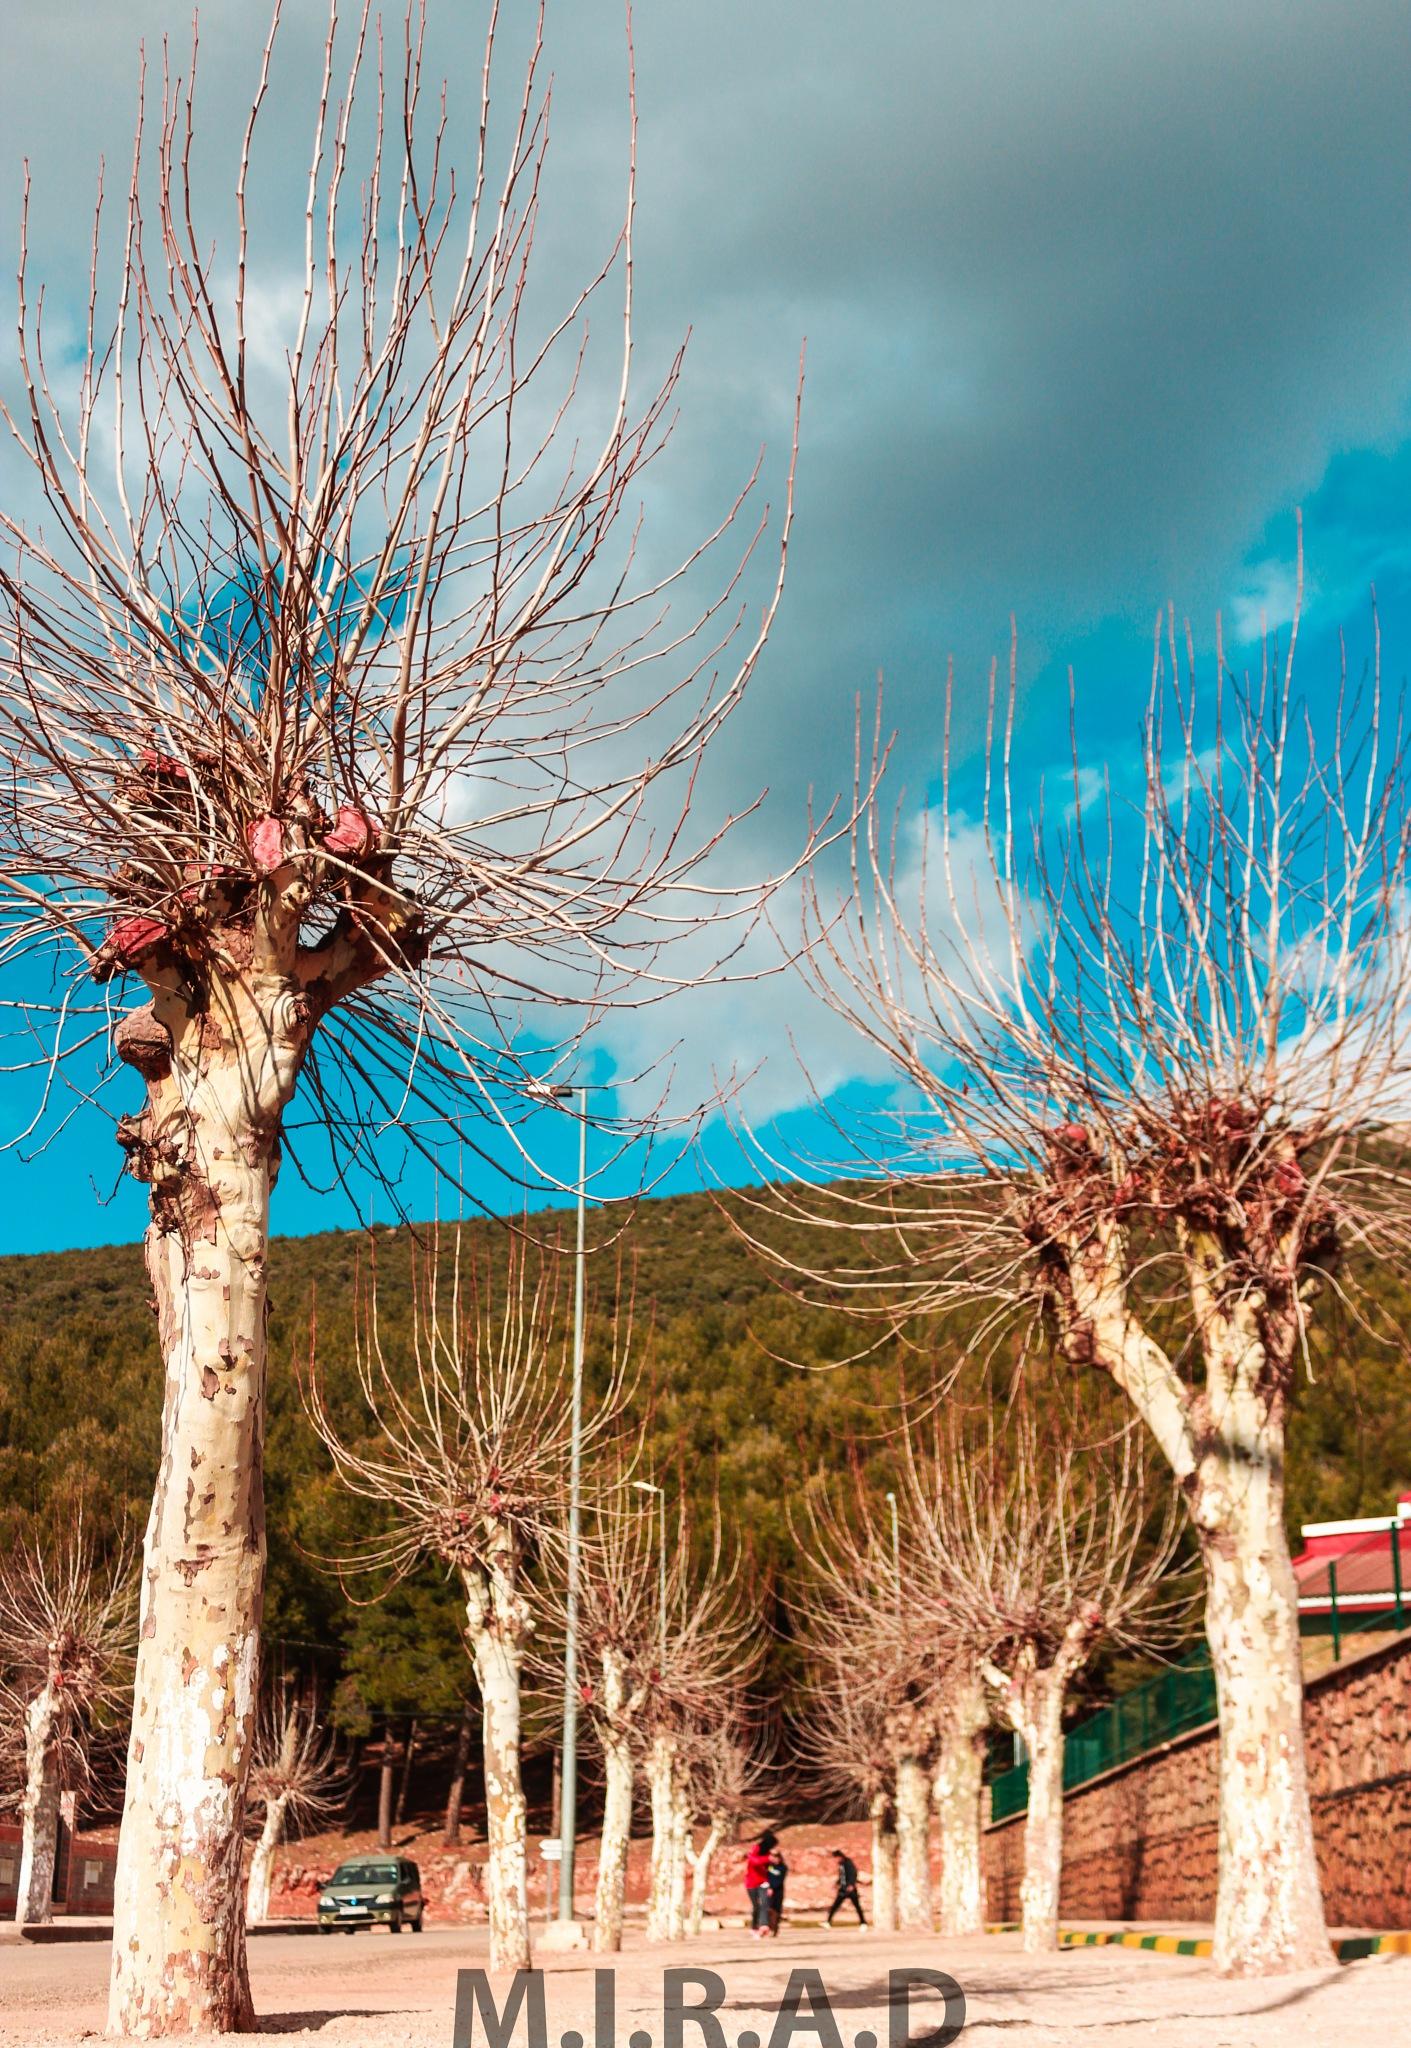 nature by Nourdin Mirad